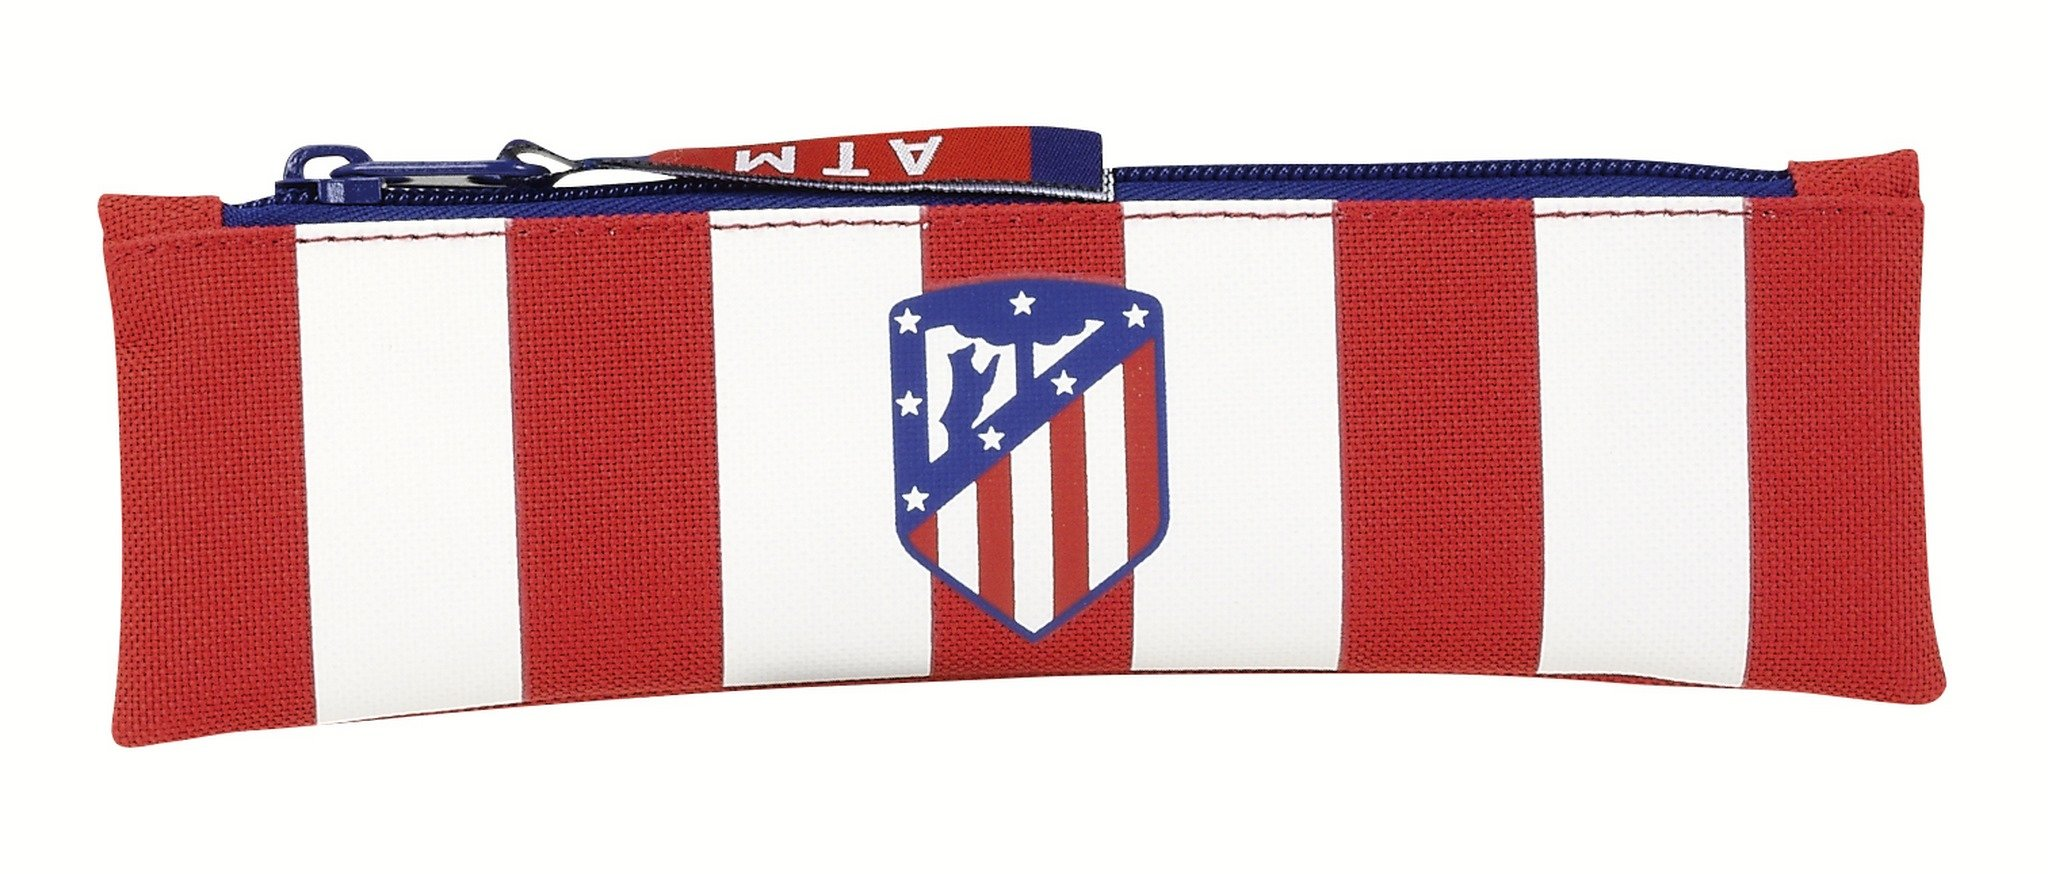 Safta Estuche Atlético De Madrid Oficial Escolar 200x60mm